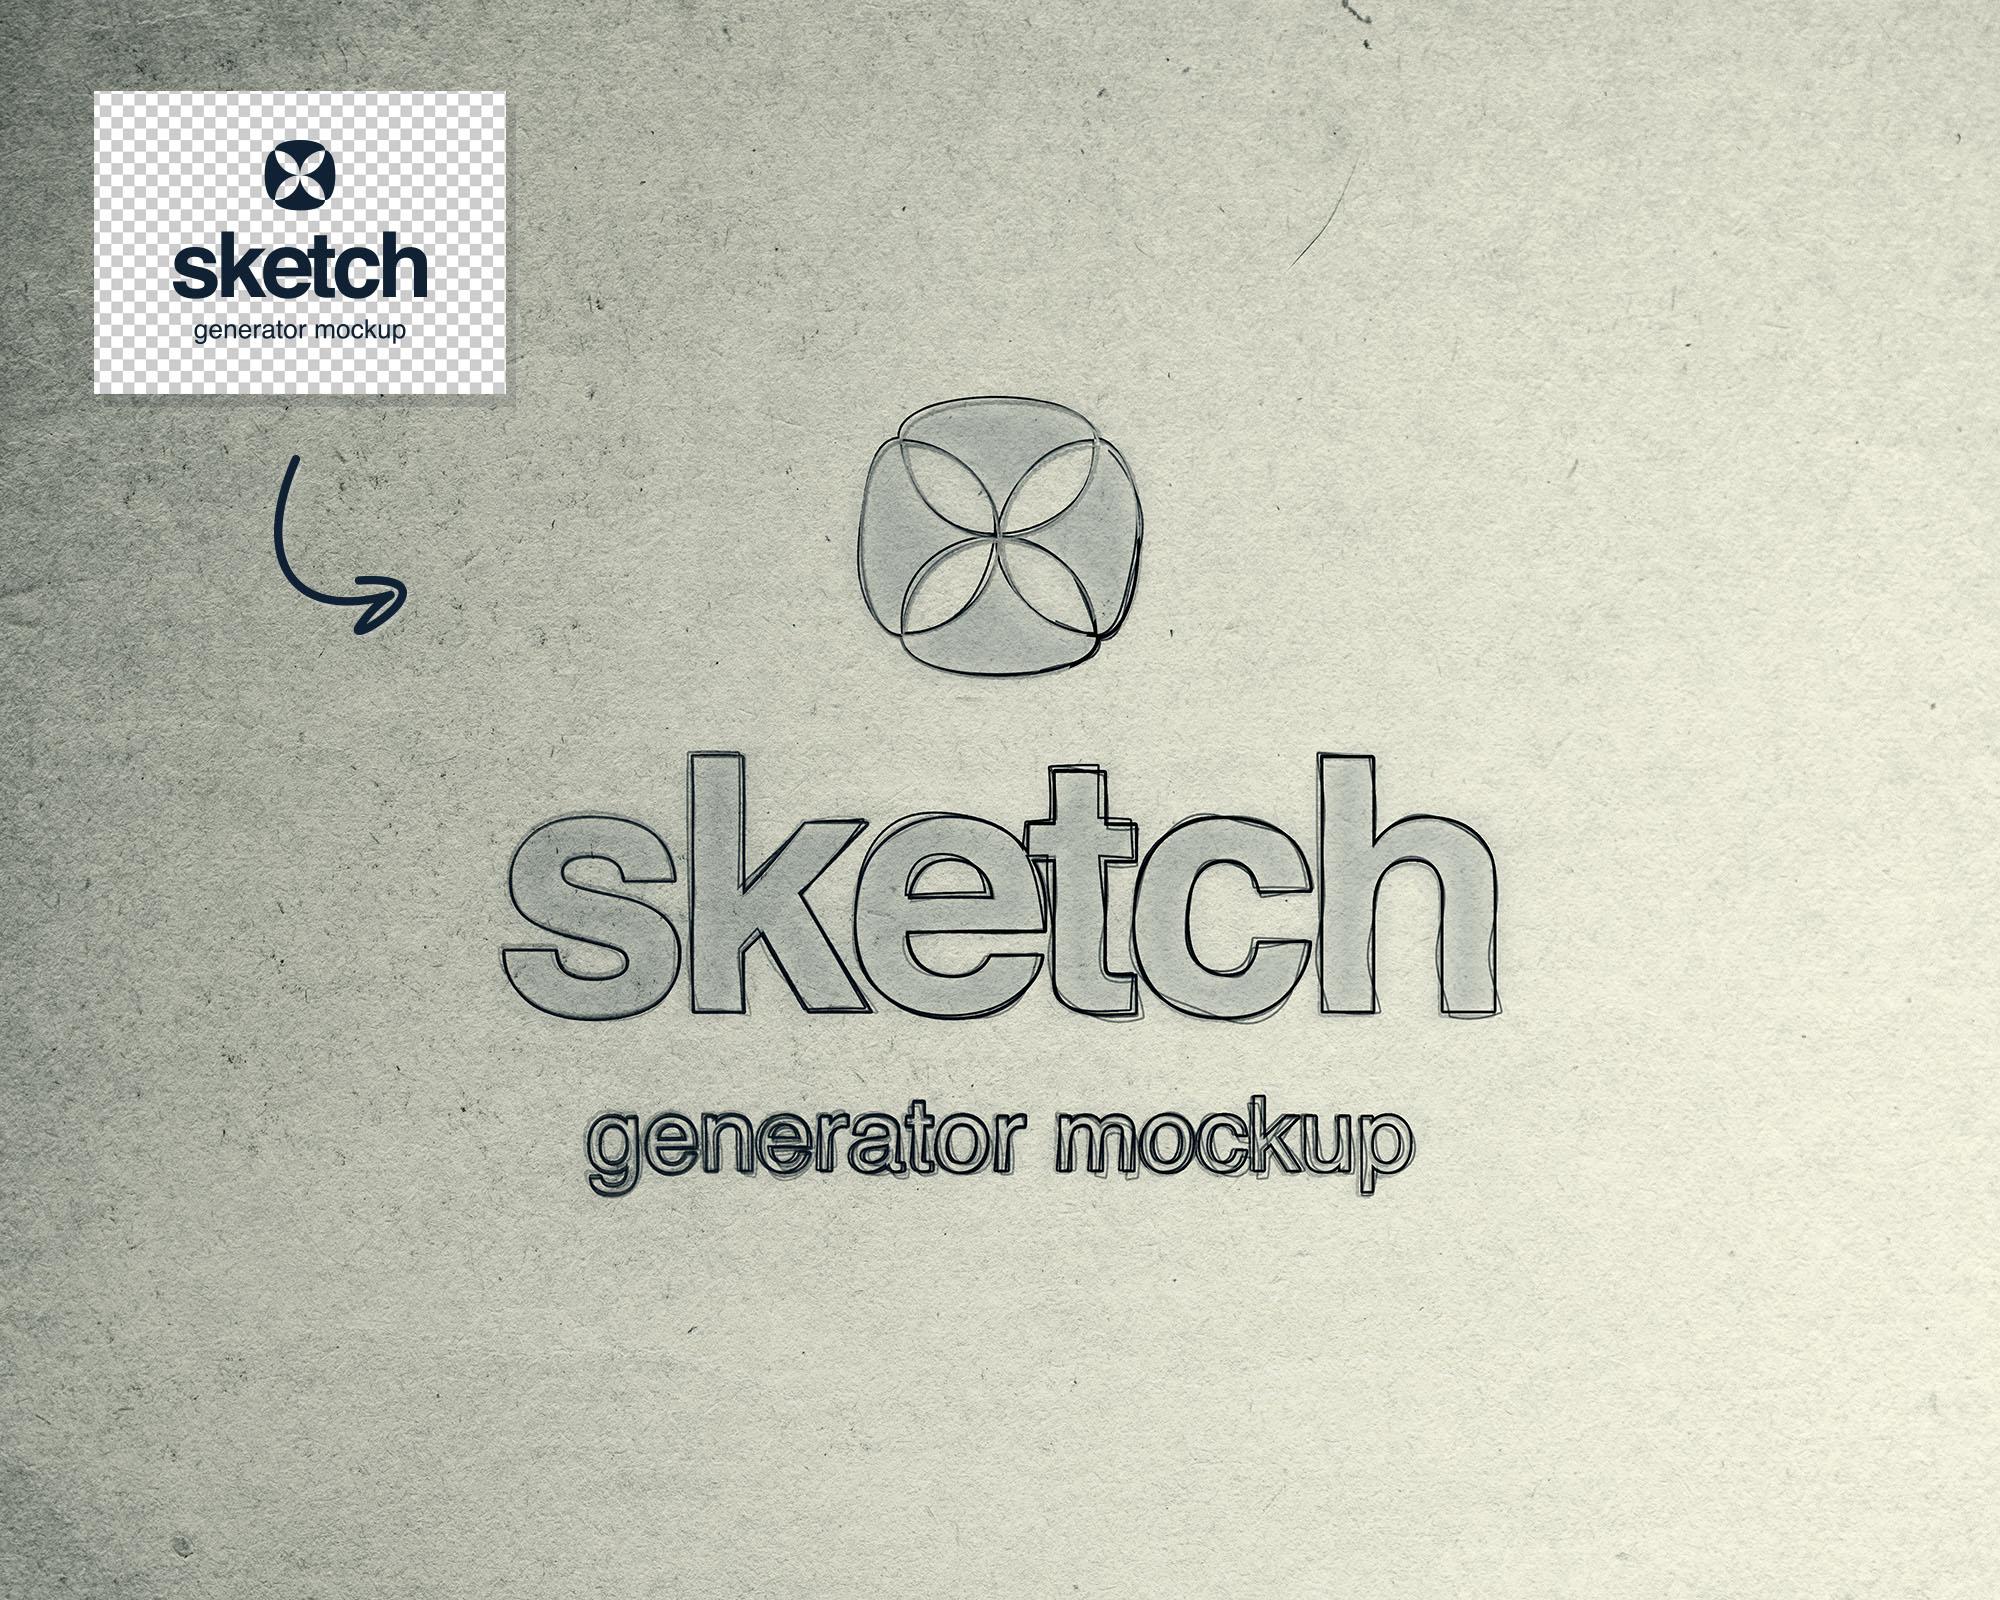 Sketch Generator Mockup